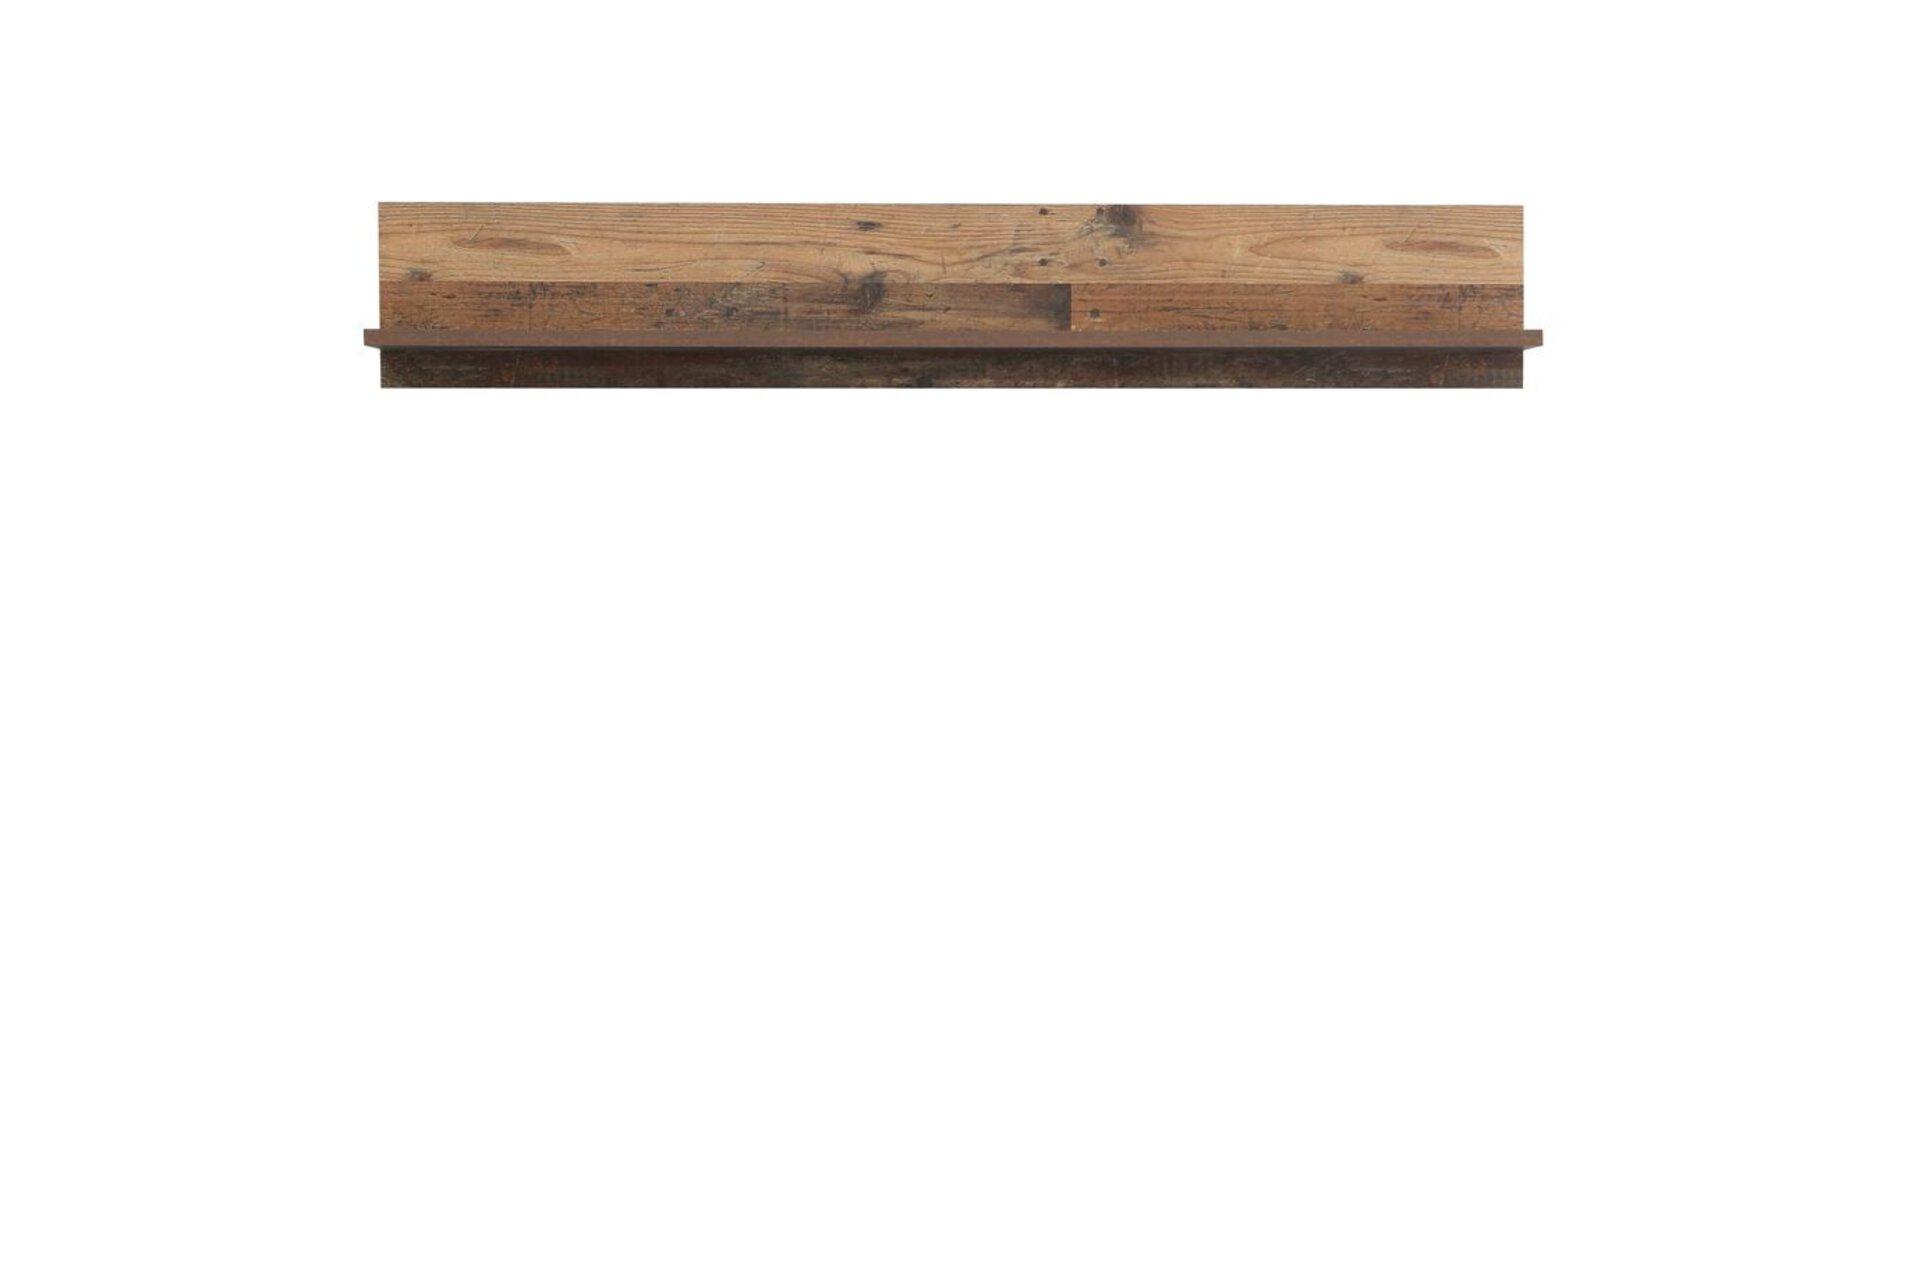 Garderobenpaneel CLIF CELECT Holzwerkstoff mehrfarbig 22 x 26 x 160 cm